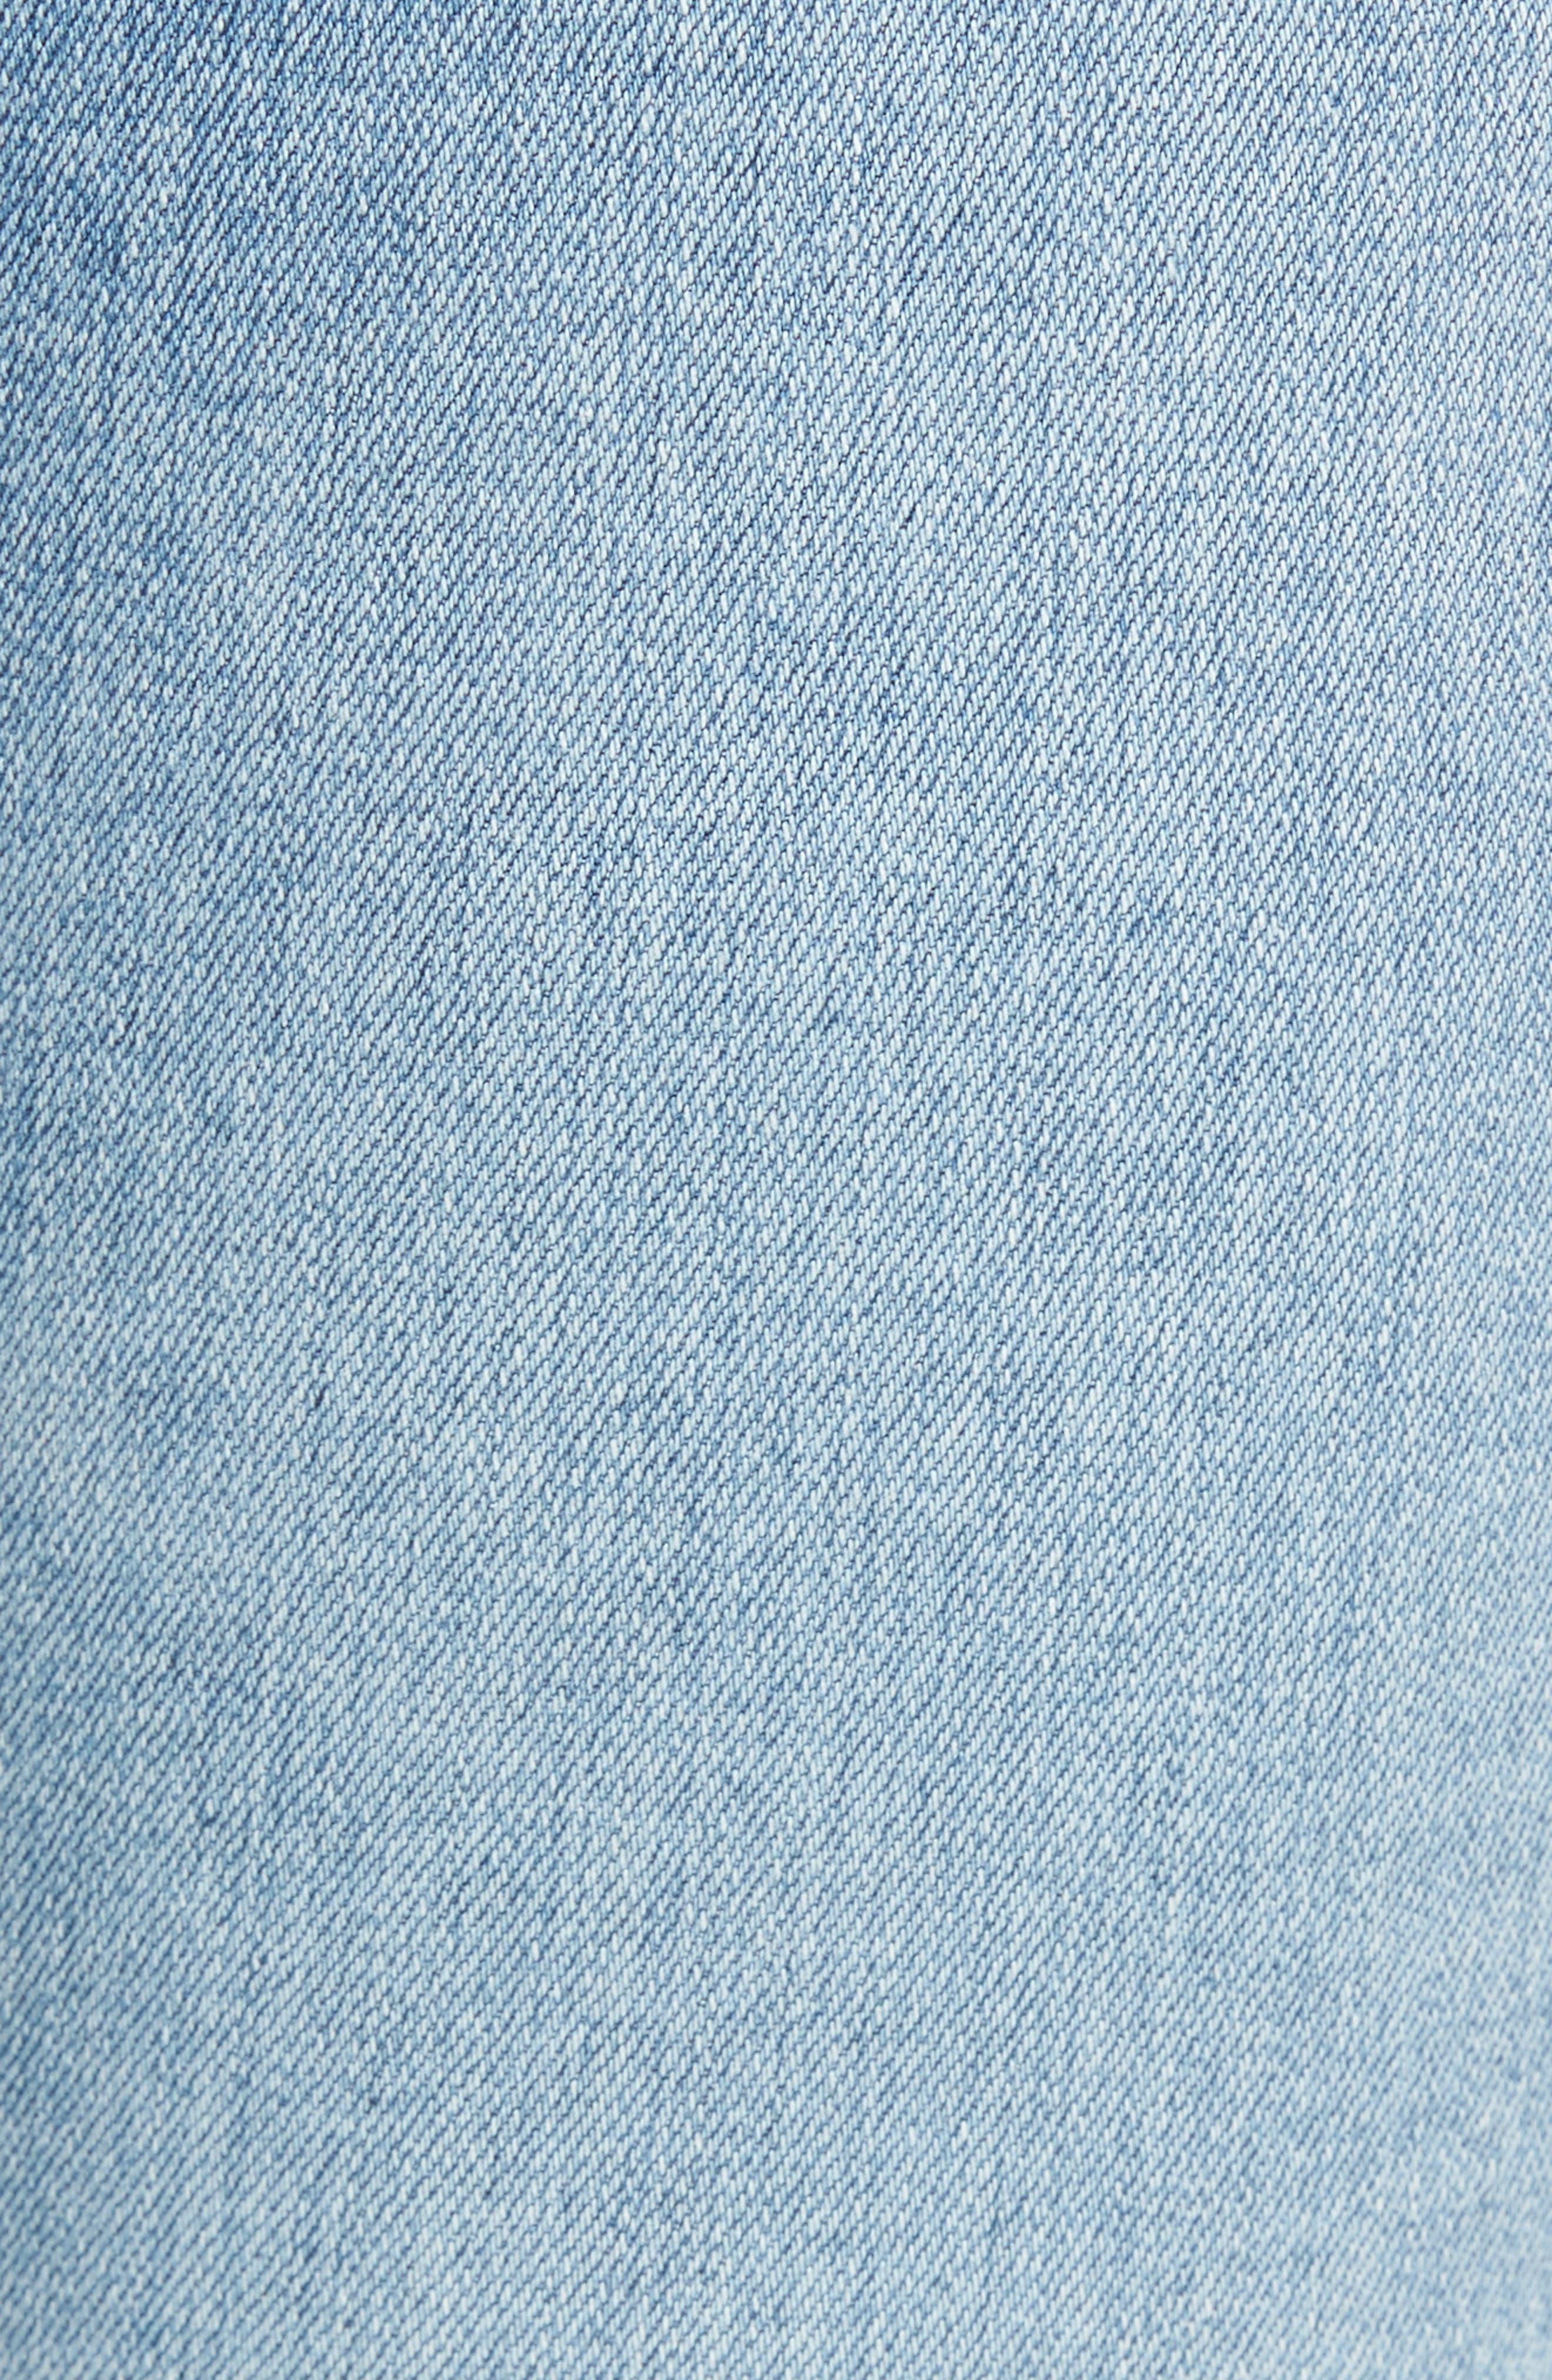 Mila High Waist Ankle Skinny Jeans,                             Alternate thumbnail 6, color,                             20 Years-Oceana Destructed